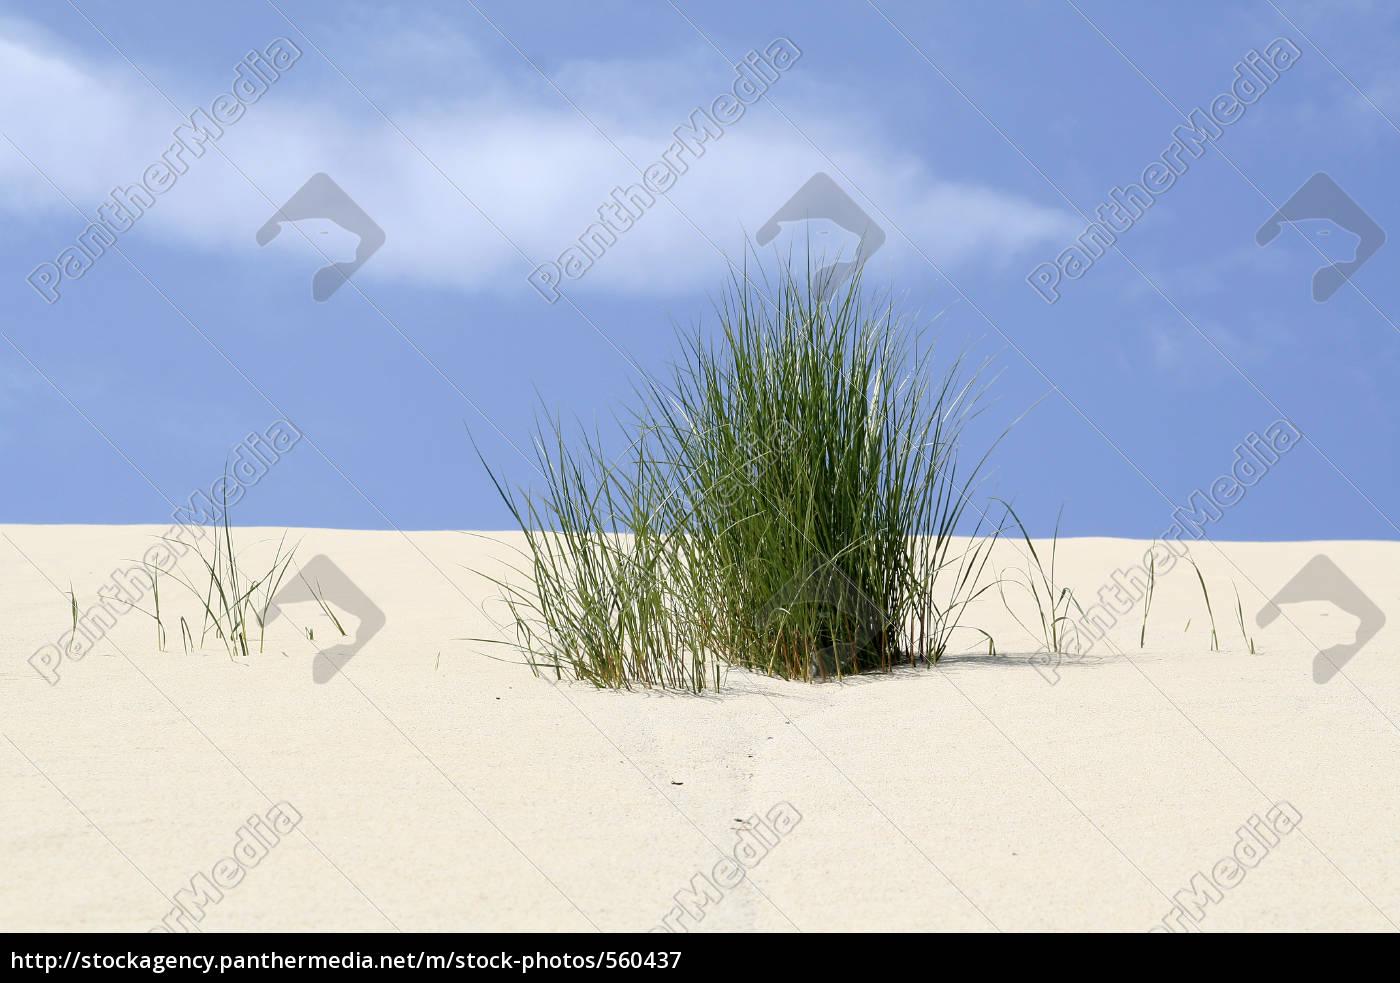 dune, grass, on, the, dune - 560437